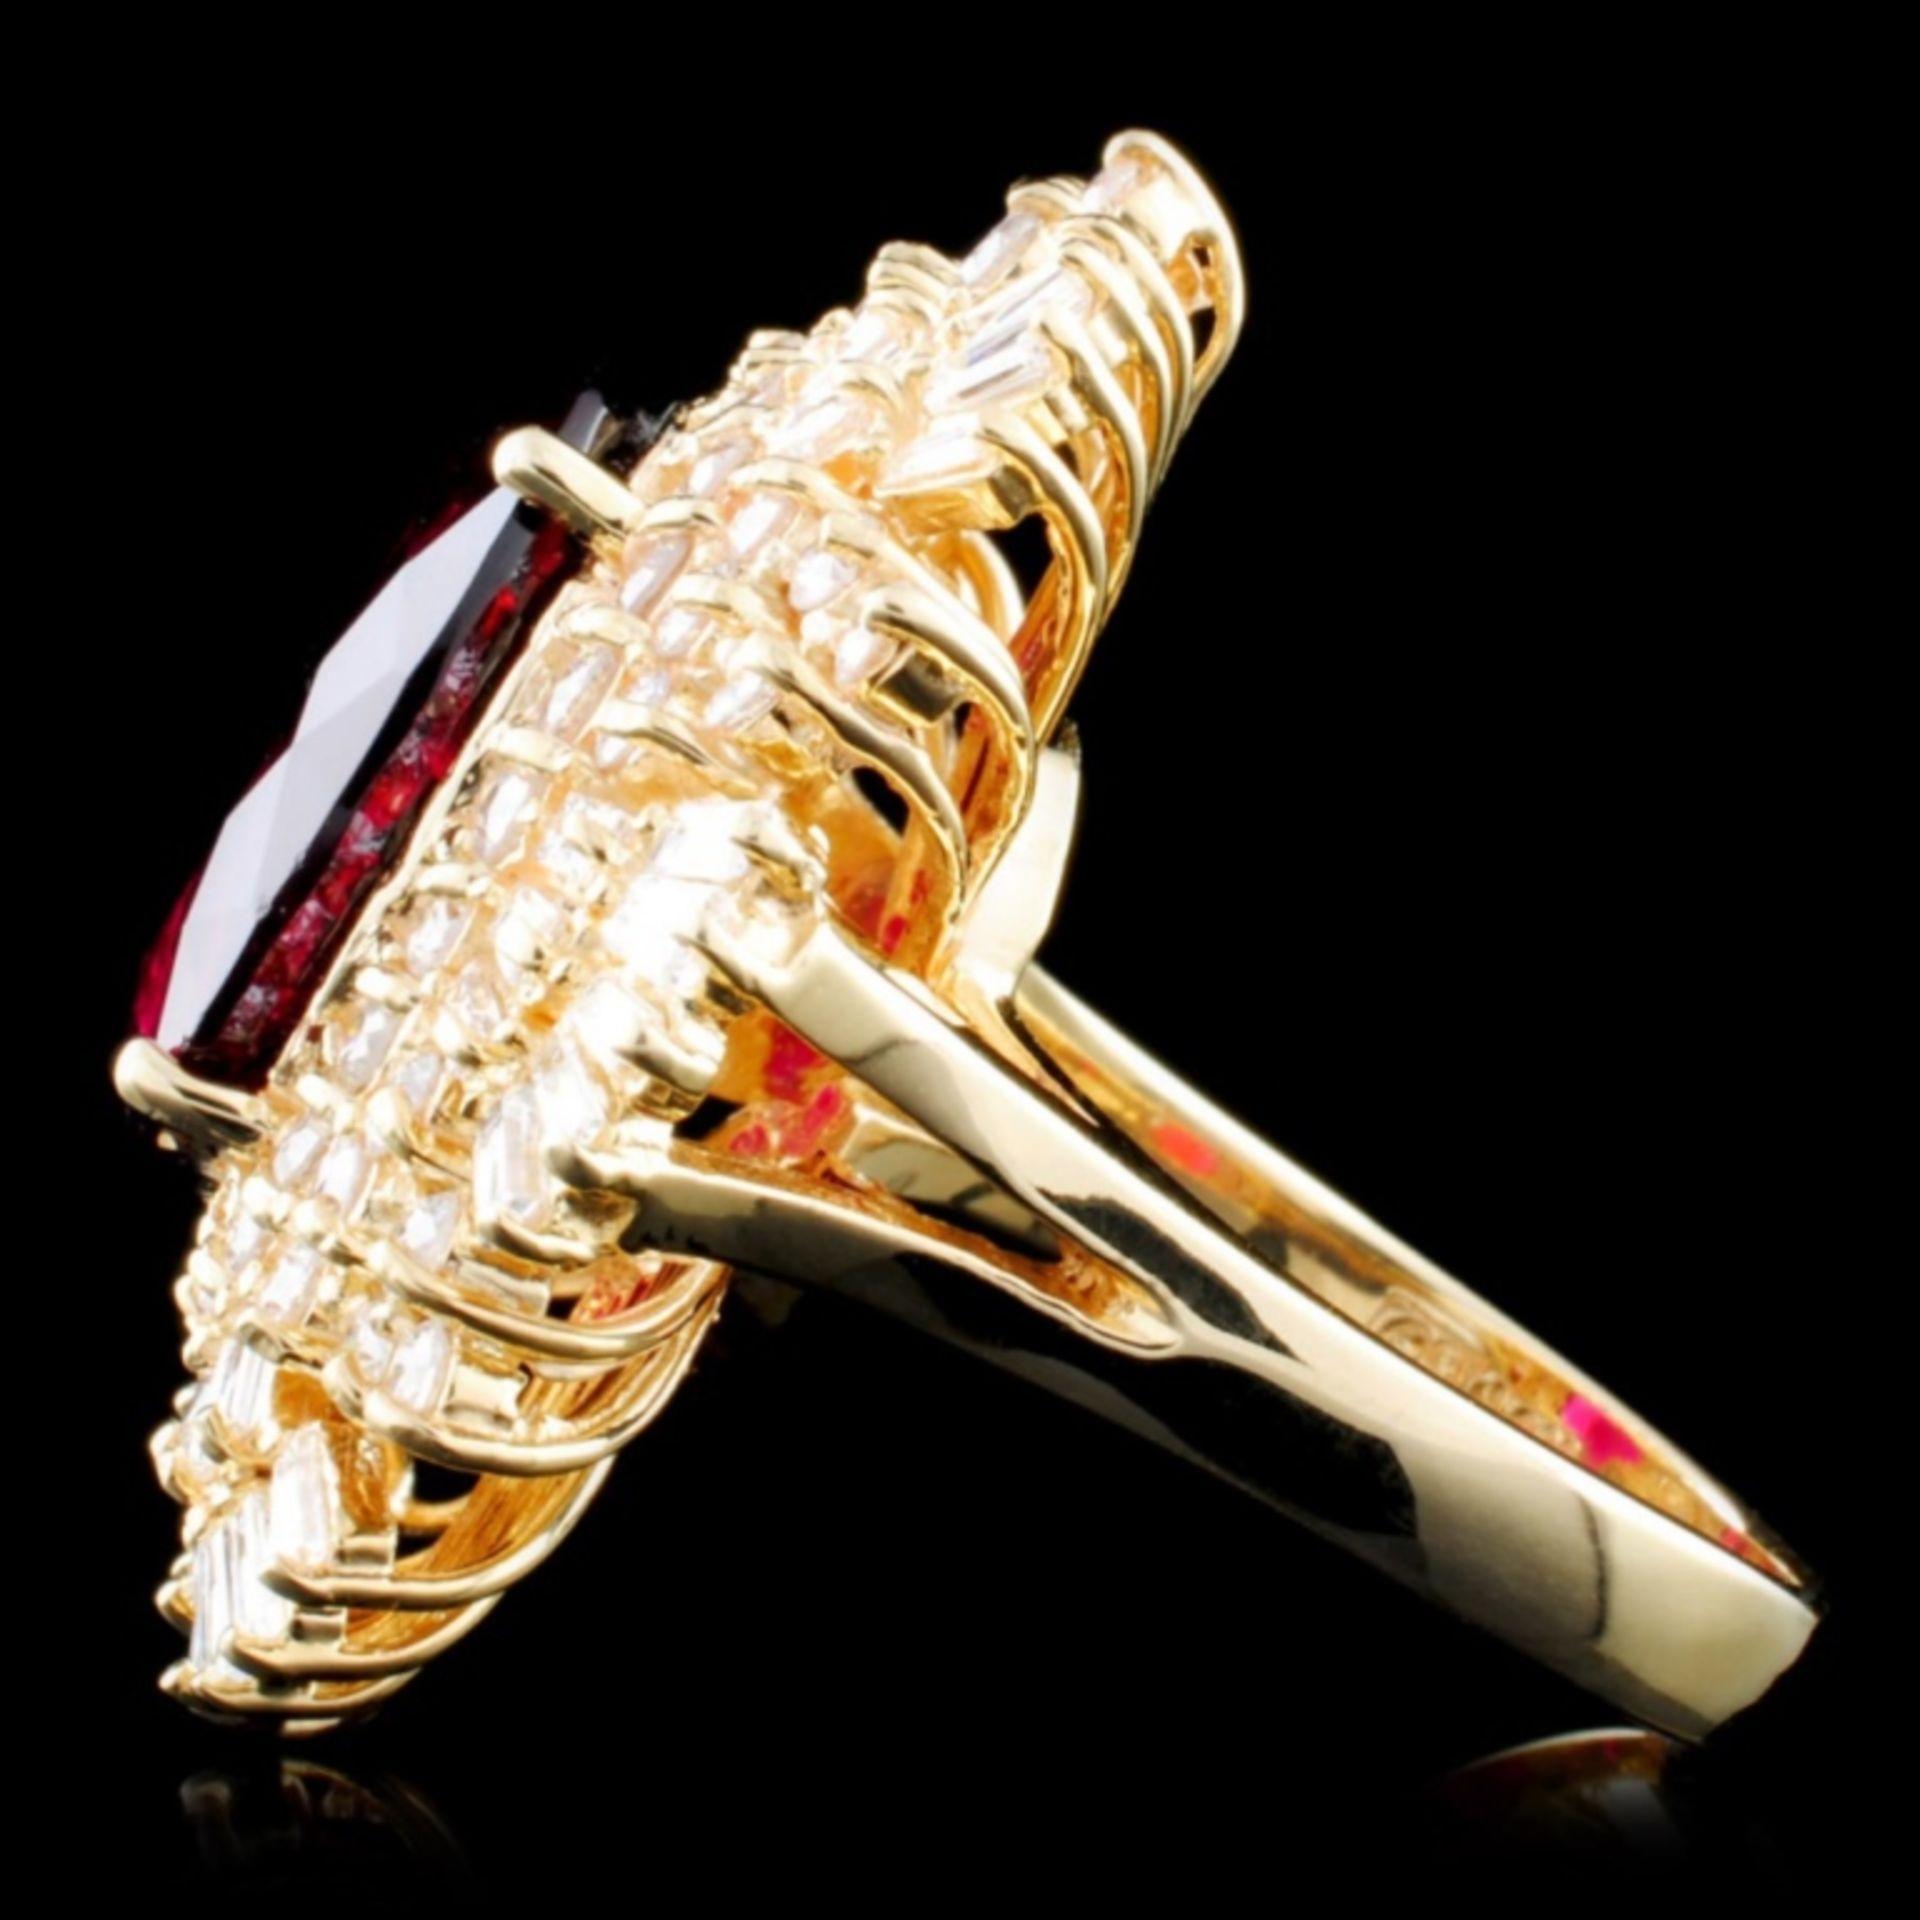 14K Gold 7.83ct Tourmaline & 2.55ctw Diamond Ring - Image 3 of 4